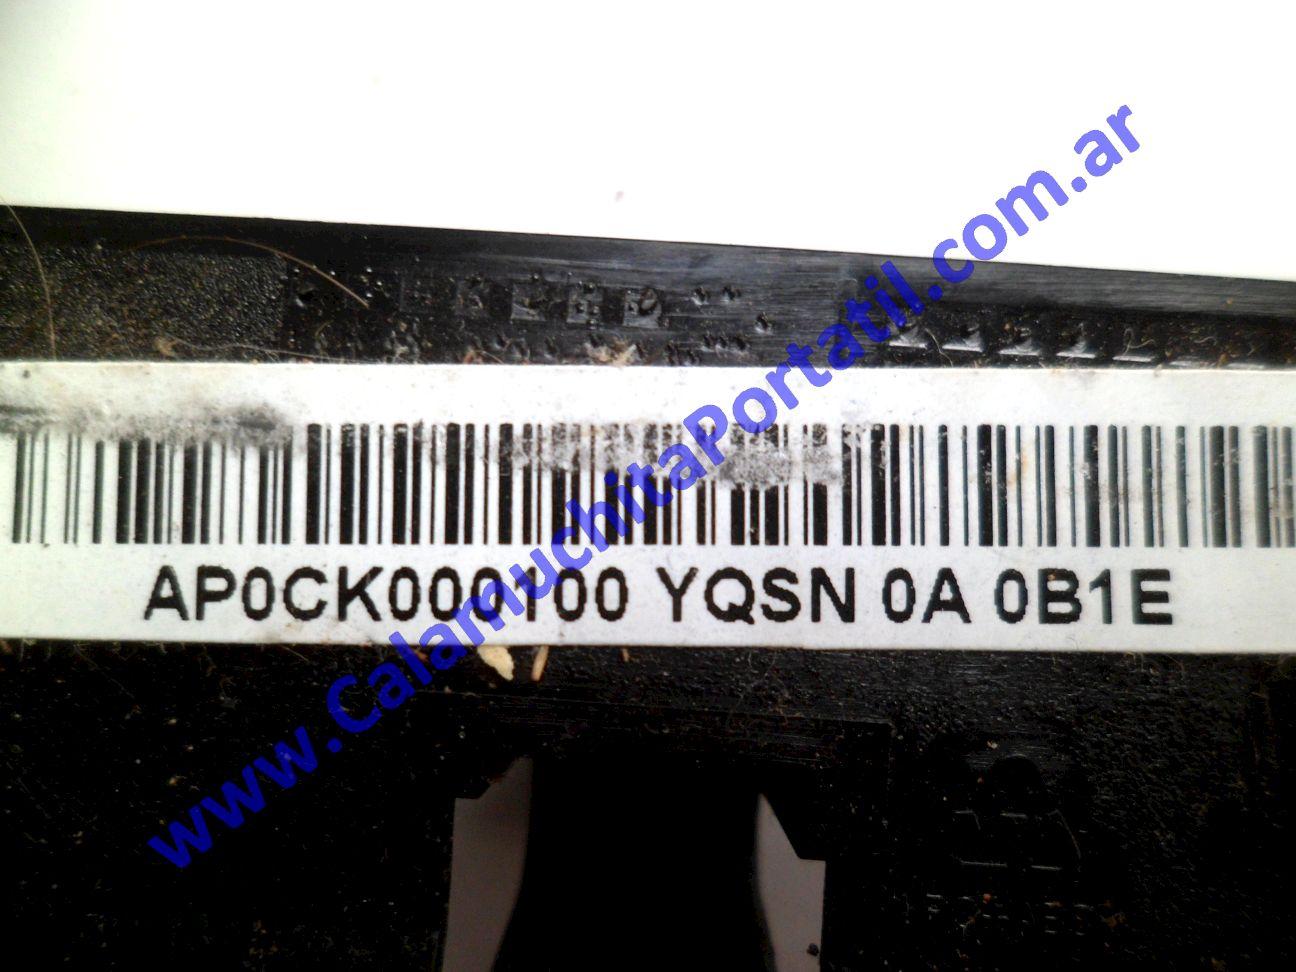 0490CAB Carcasa Marco Toshiba Satellite L675D-S7106 / PSK3JU-08602PB